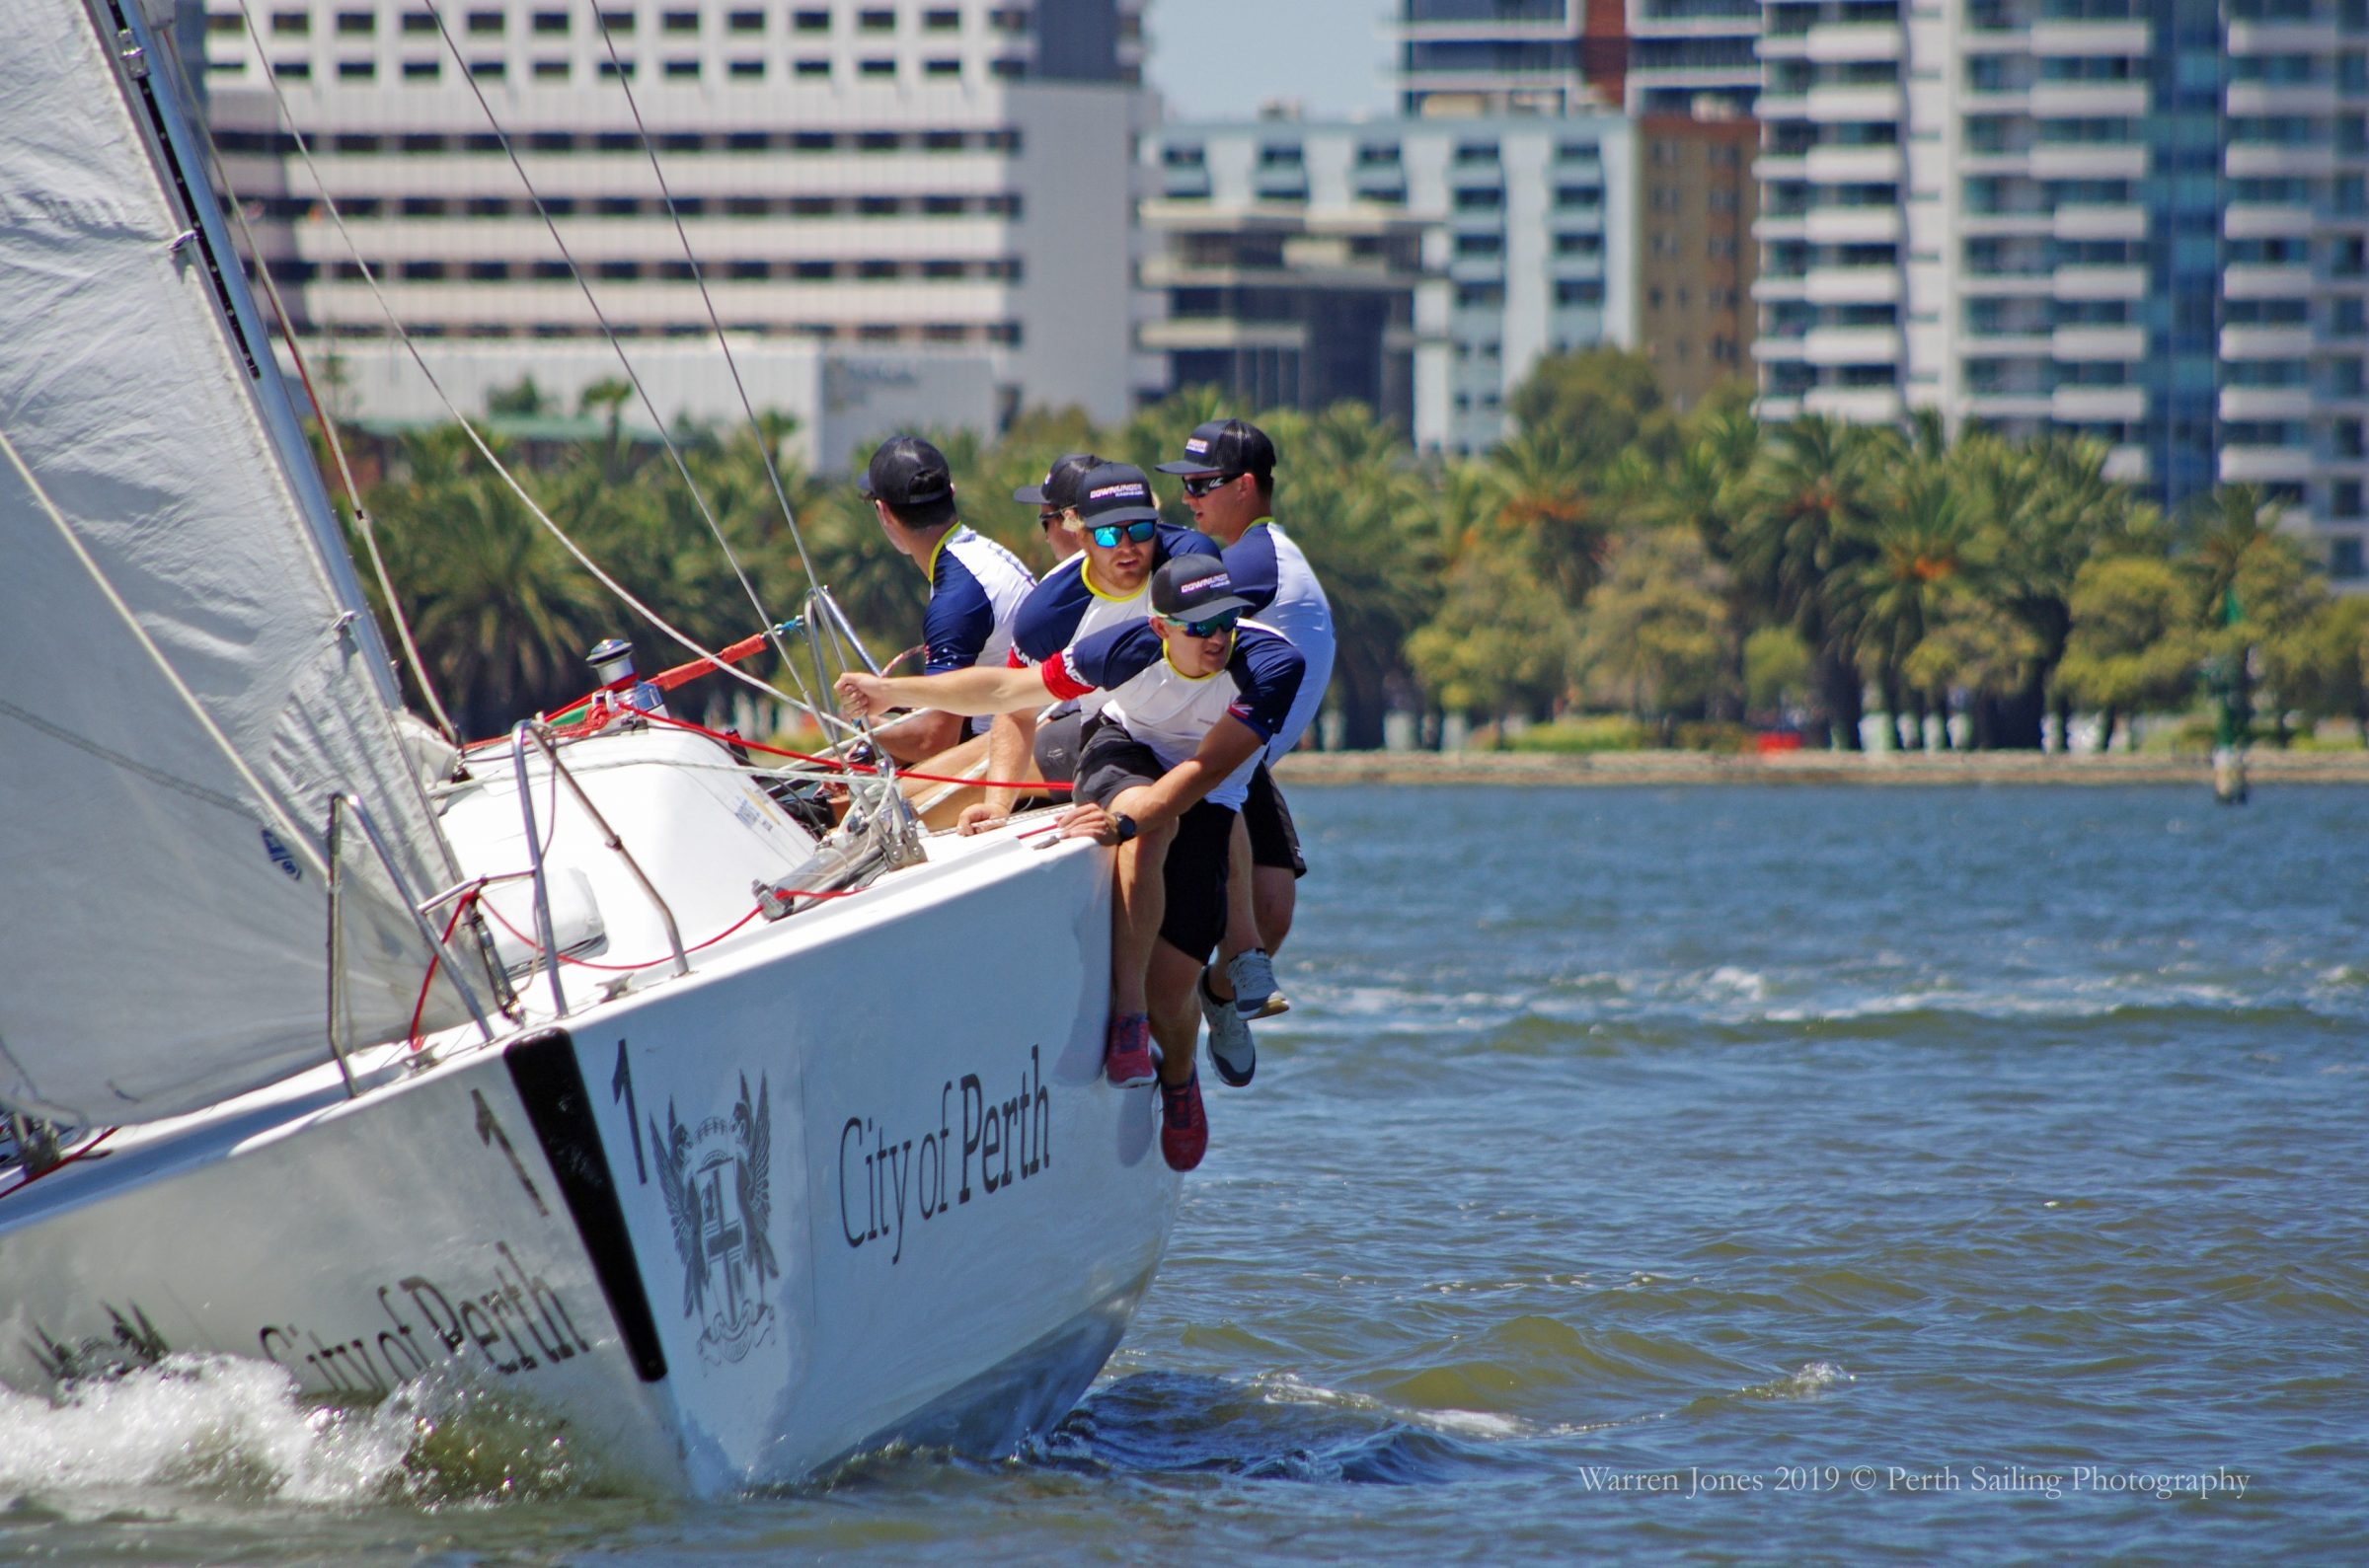 2019 City of Perth Festival of Sail Day 2 Warren Jones International